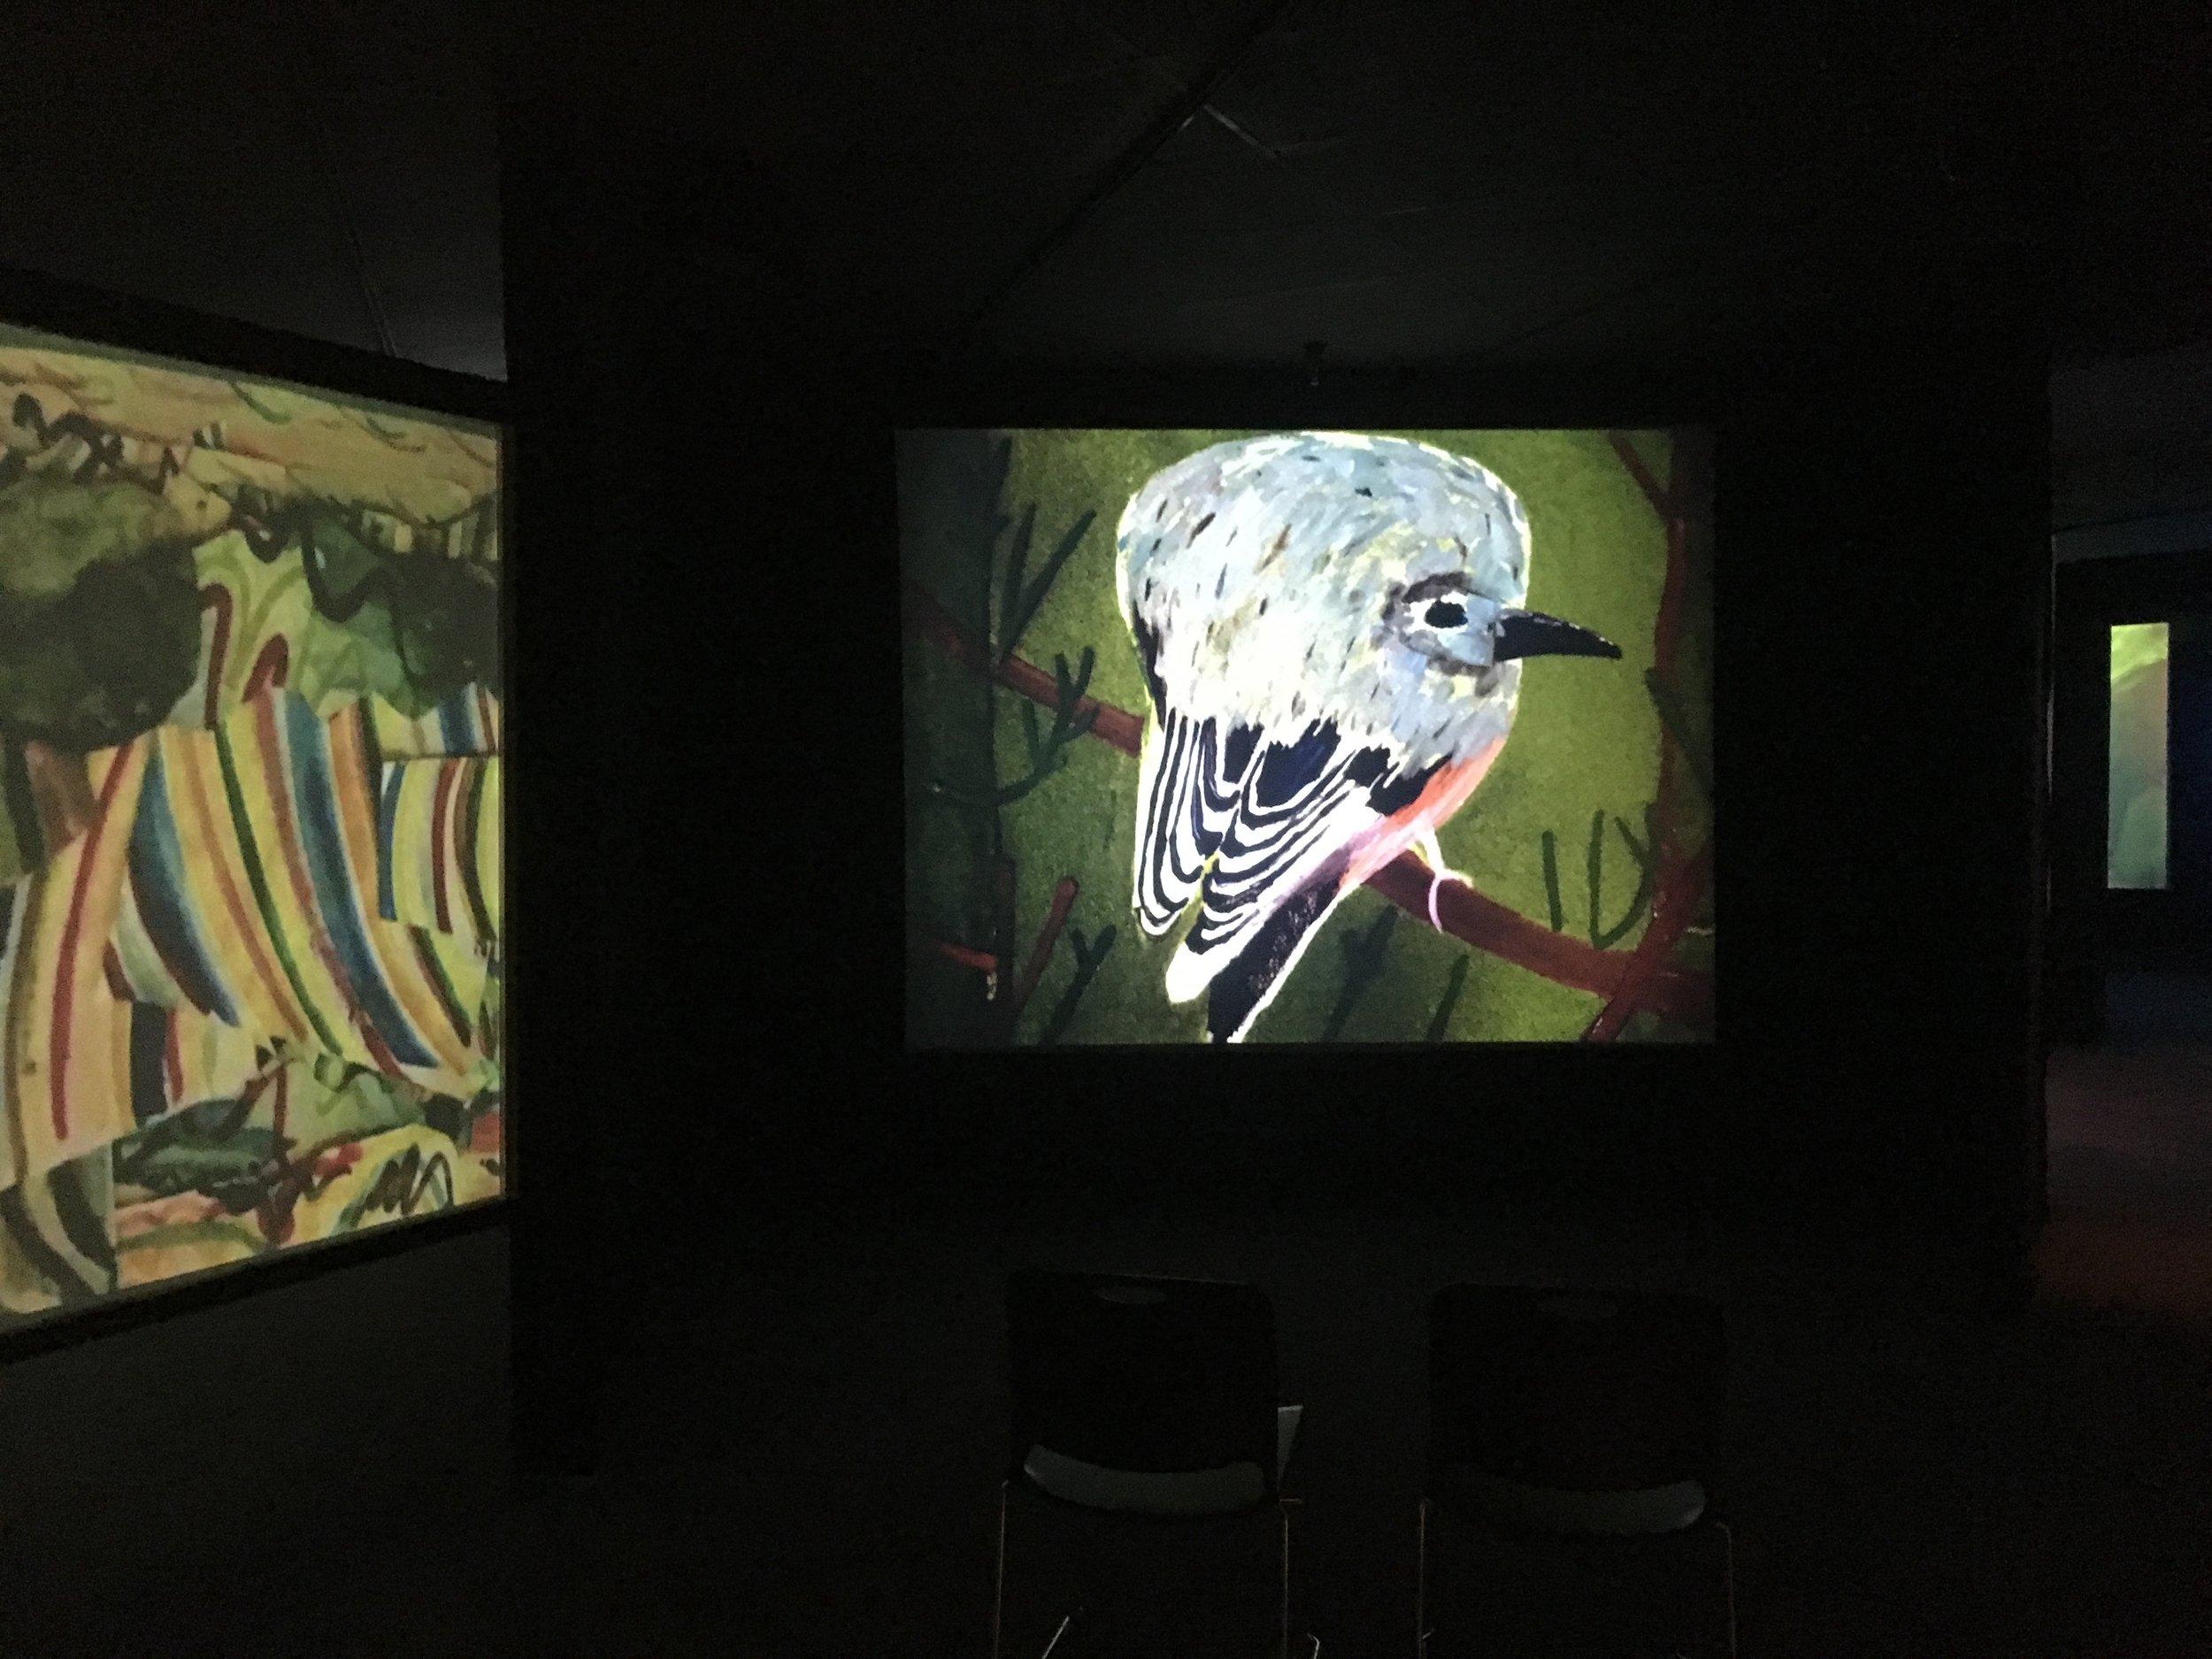 Ezra Johnson Animations 2006-2016 at Young Projects, LA